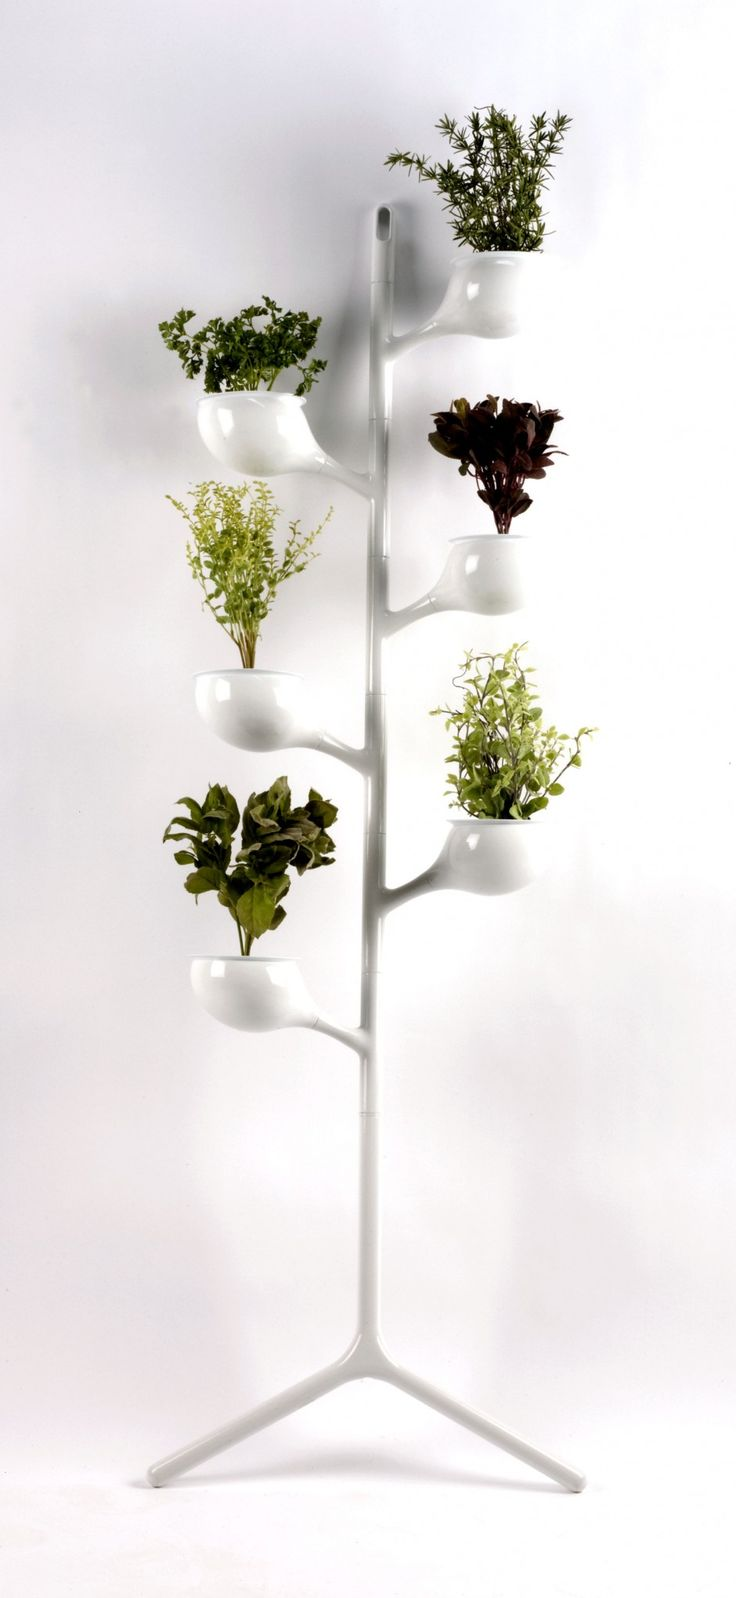 planter / Peter J. Pless at SaloneSatellite 2010